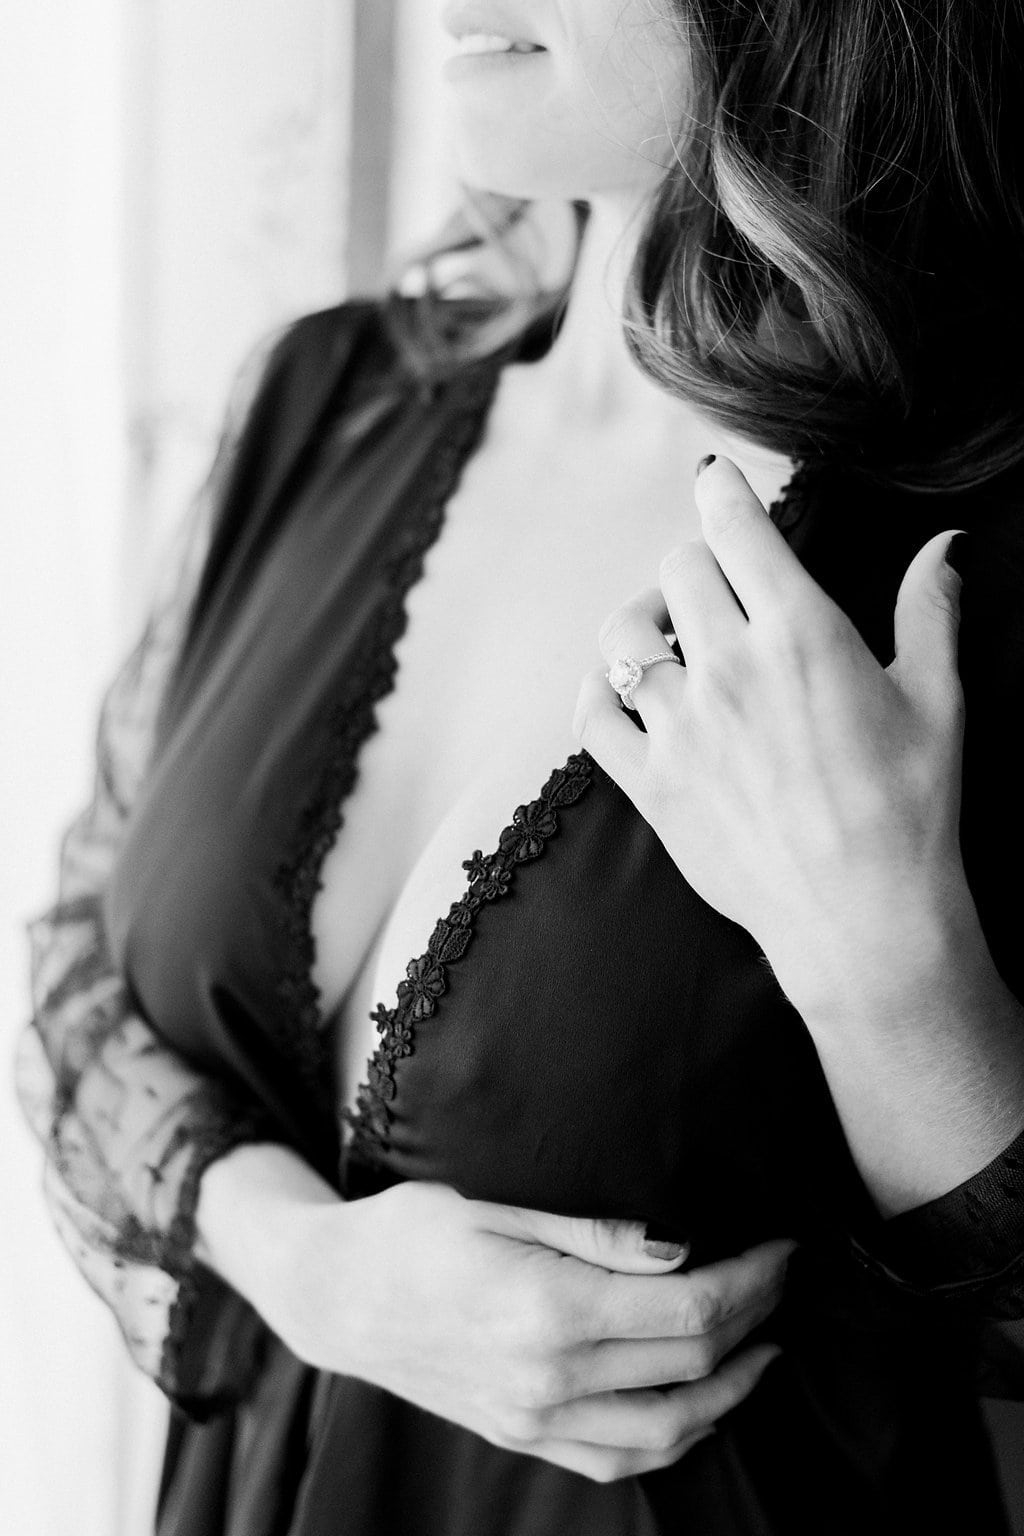 Black and white image of boudoir photo using window light